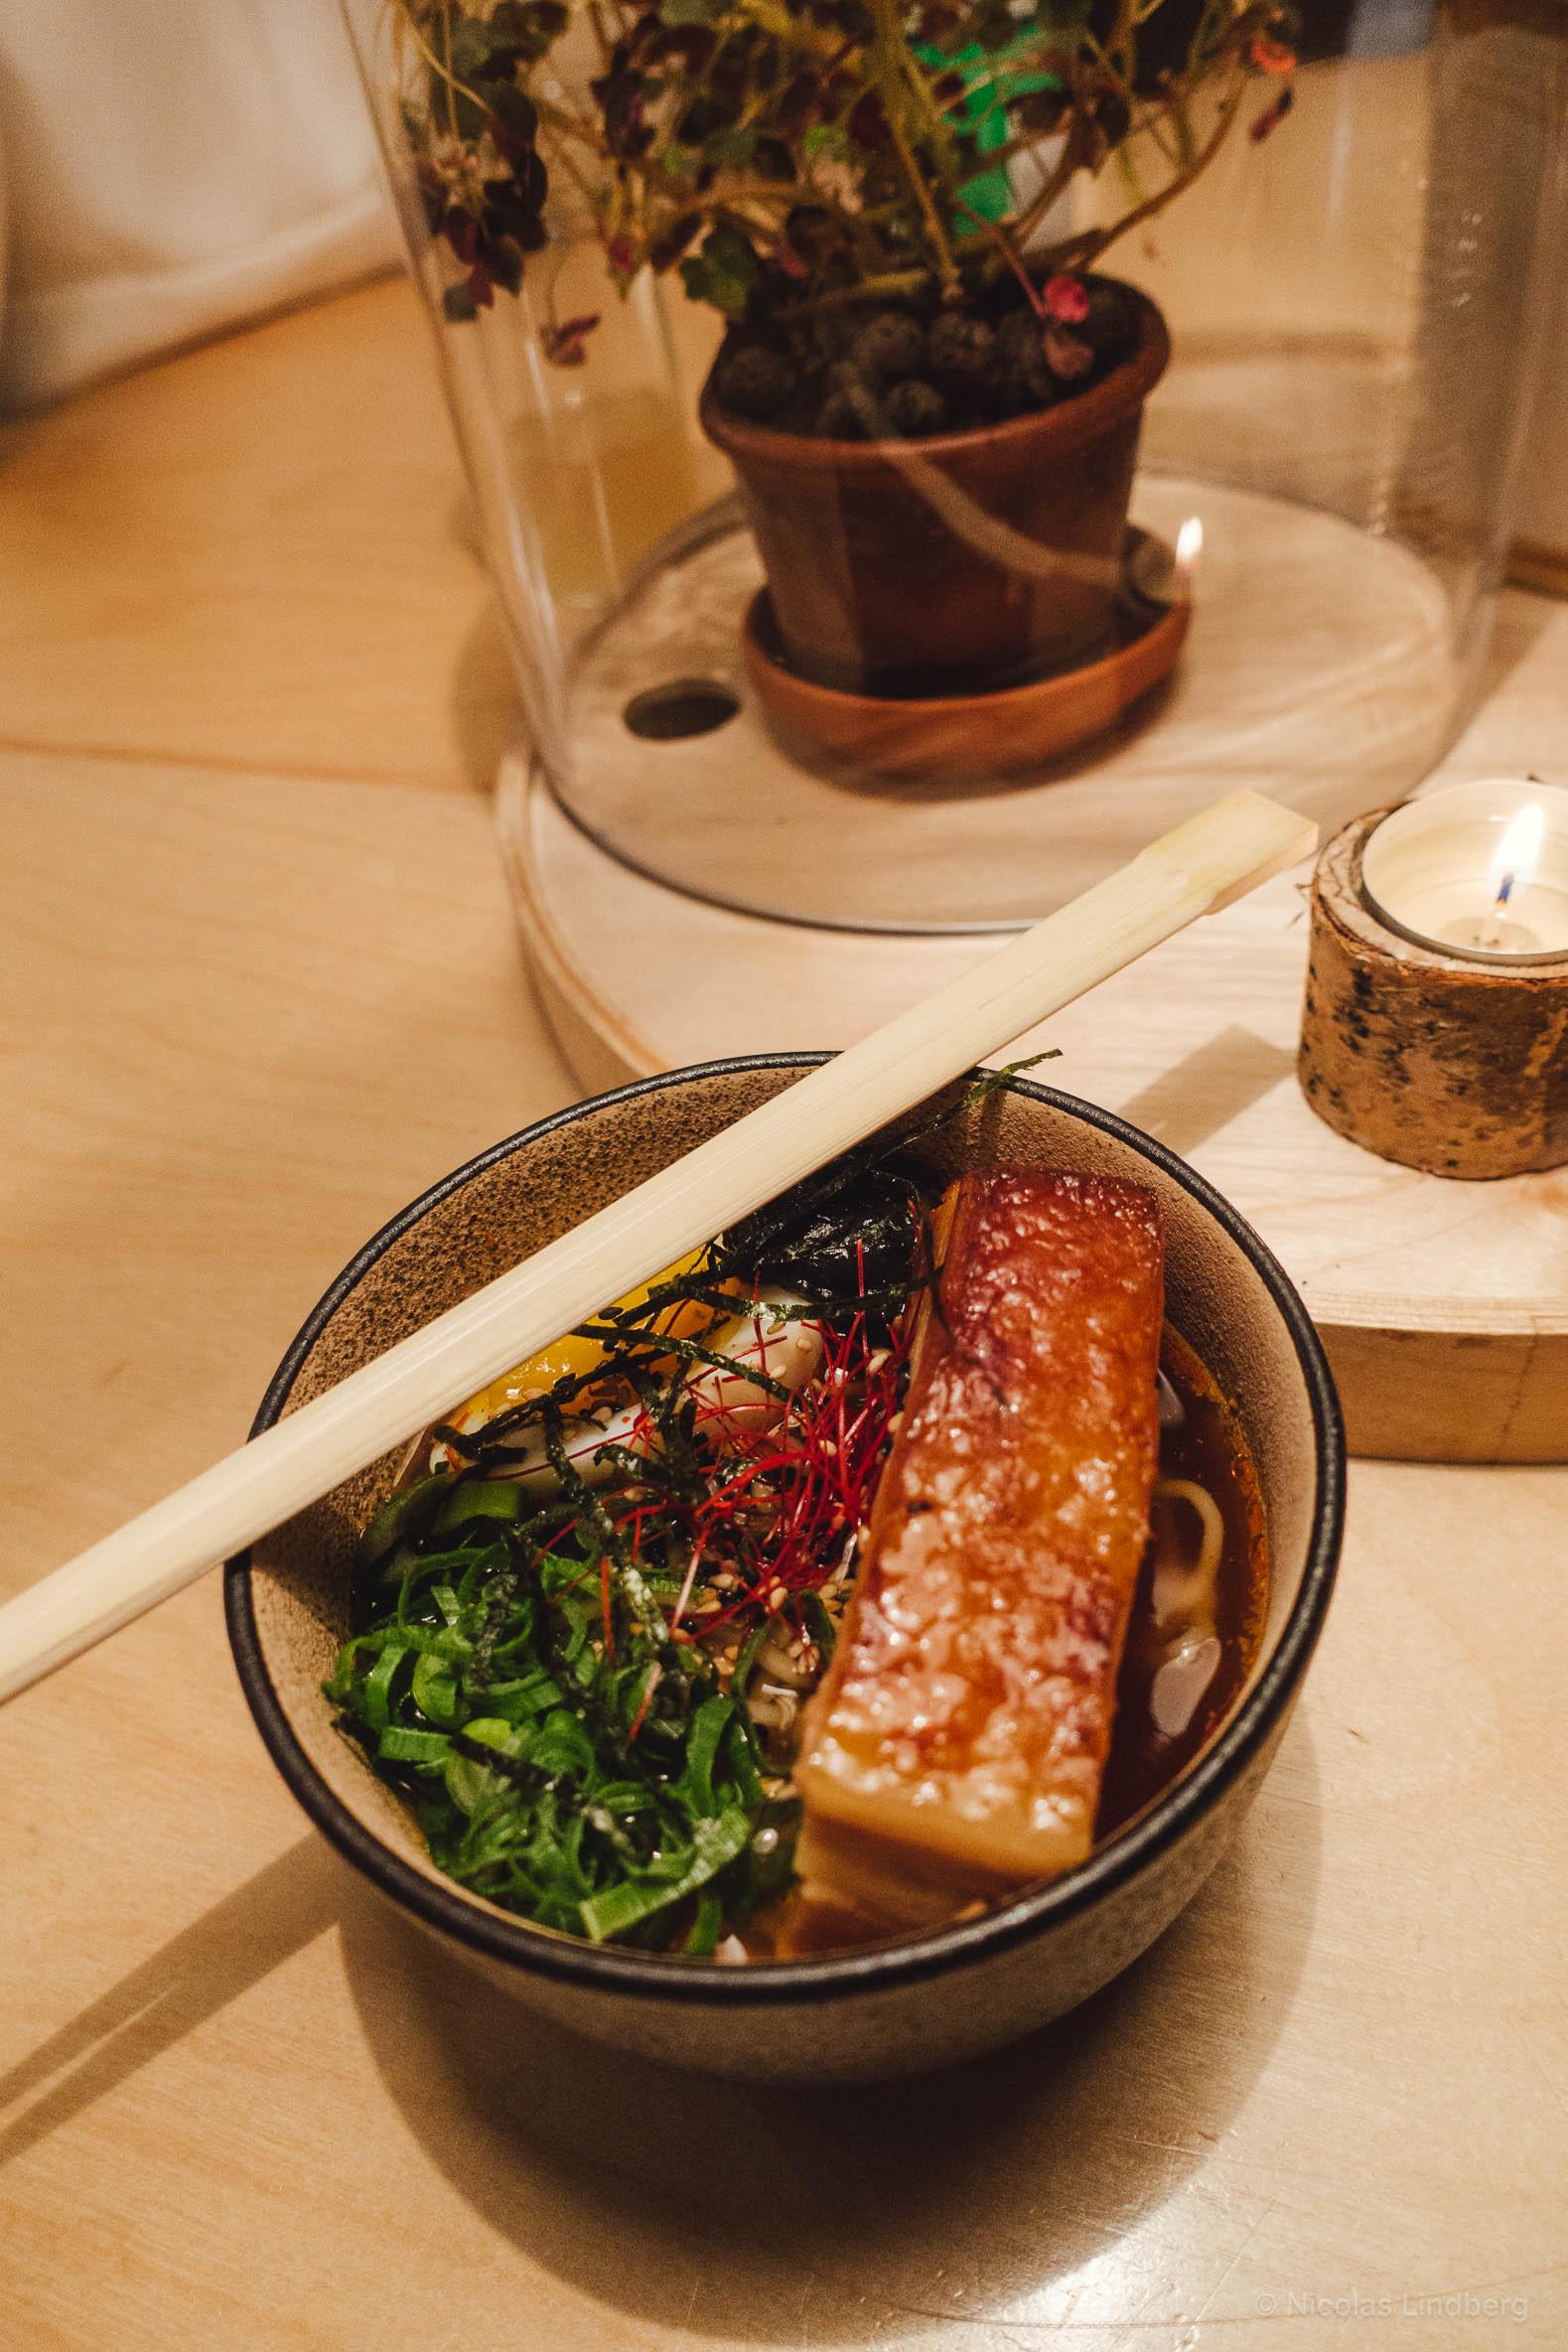 Ramen, broth, sesame, nori, soy, scallions, egg and pork belly